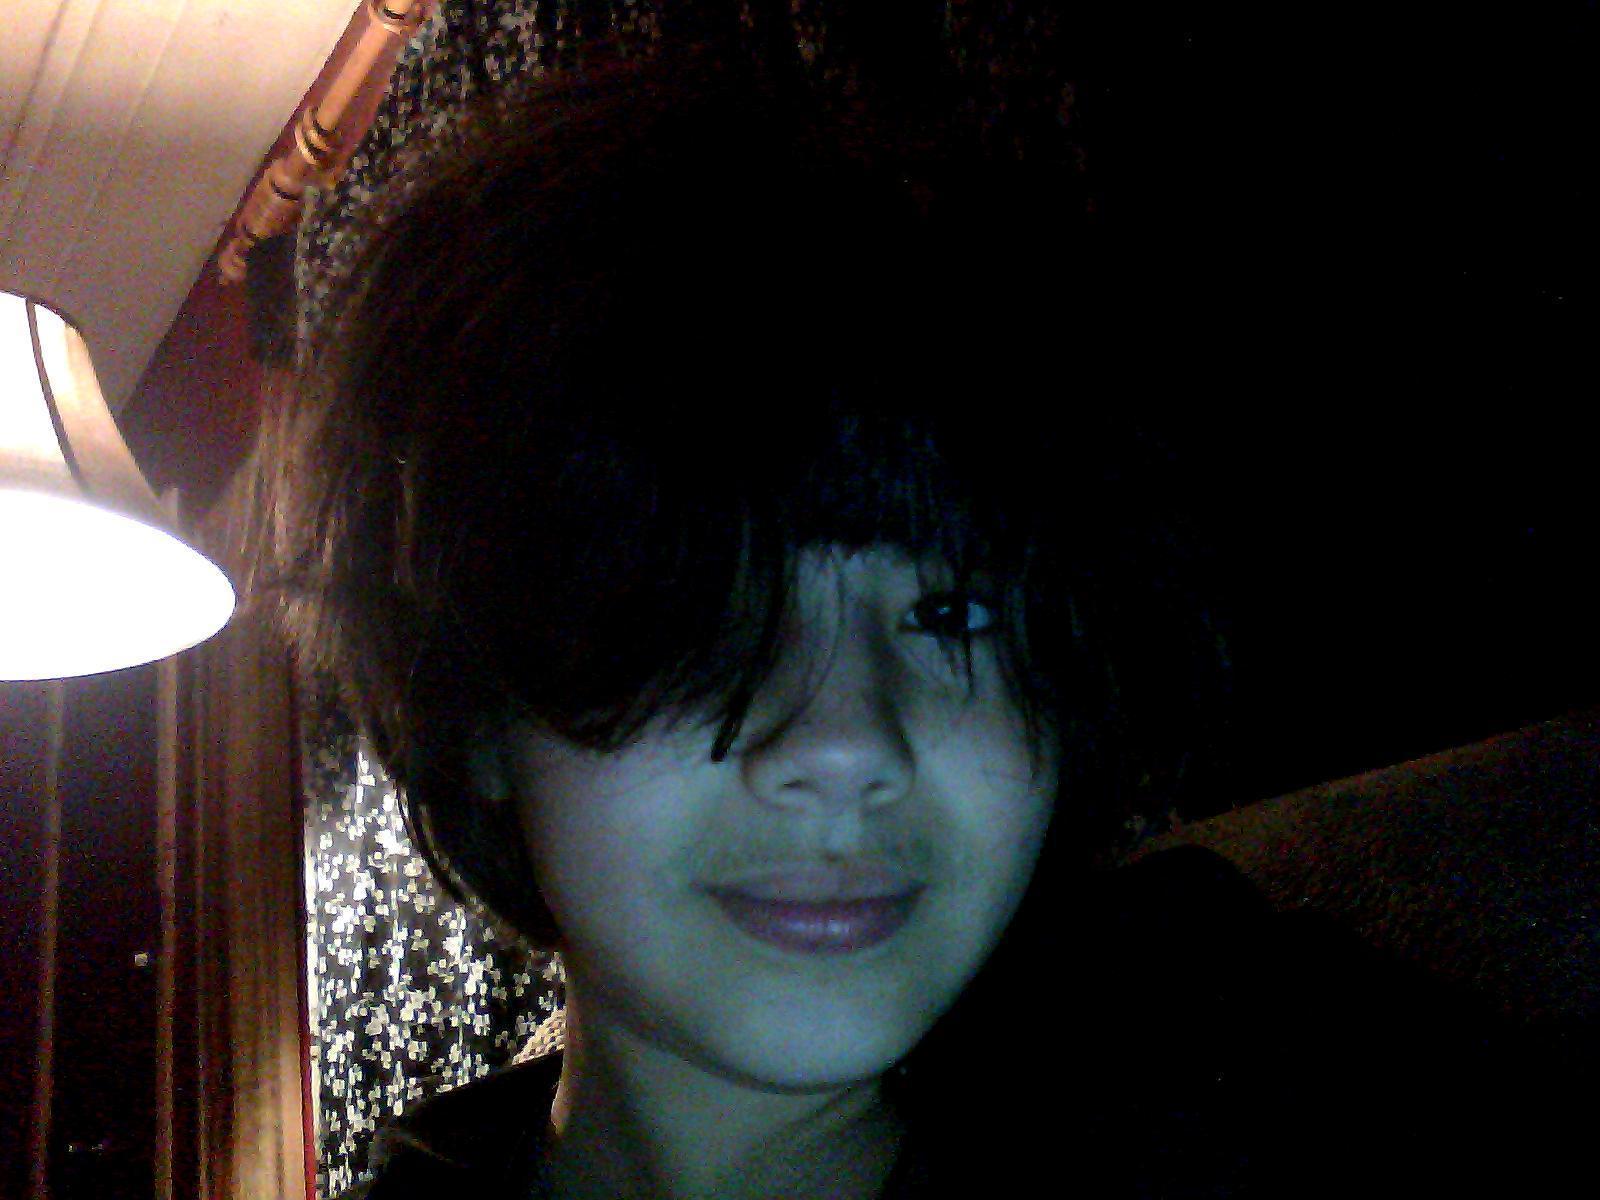 Takumi Usui X Misaki Ayuzawa Images Me Wiith Meh New Haircut Odo Xd